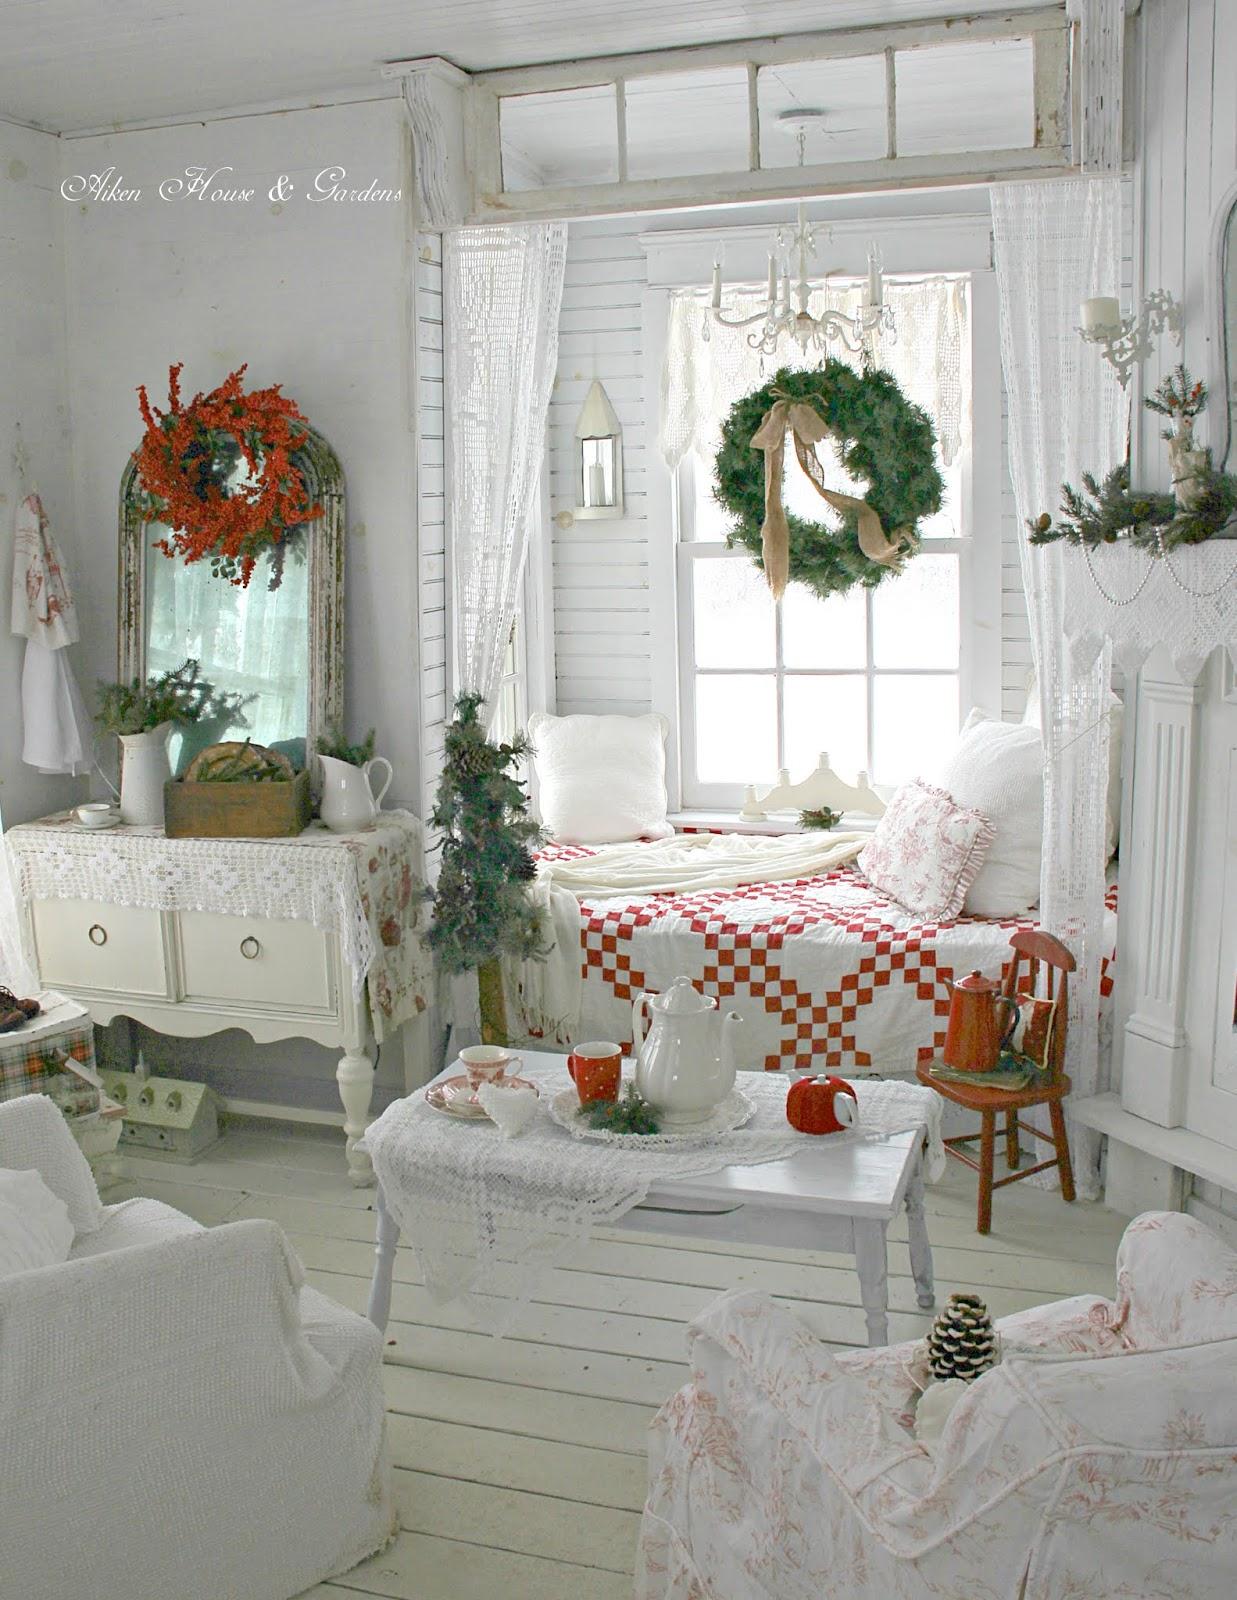 Aiken house gardens a white christmas for Aiken house